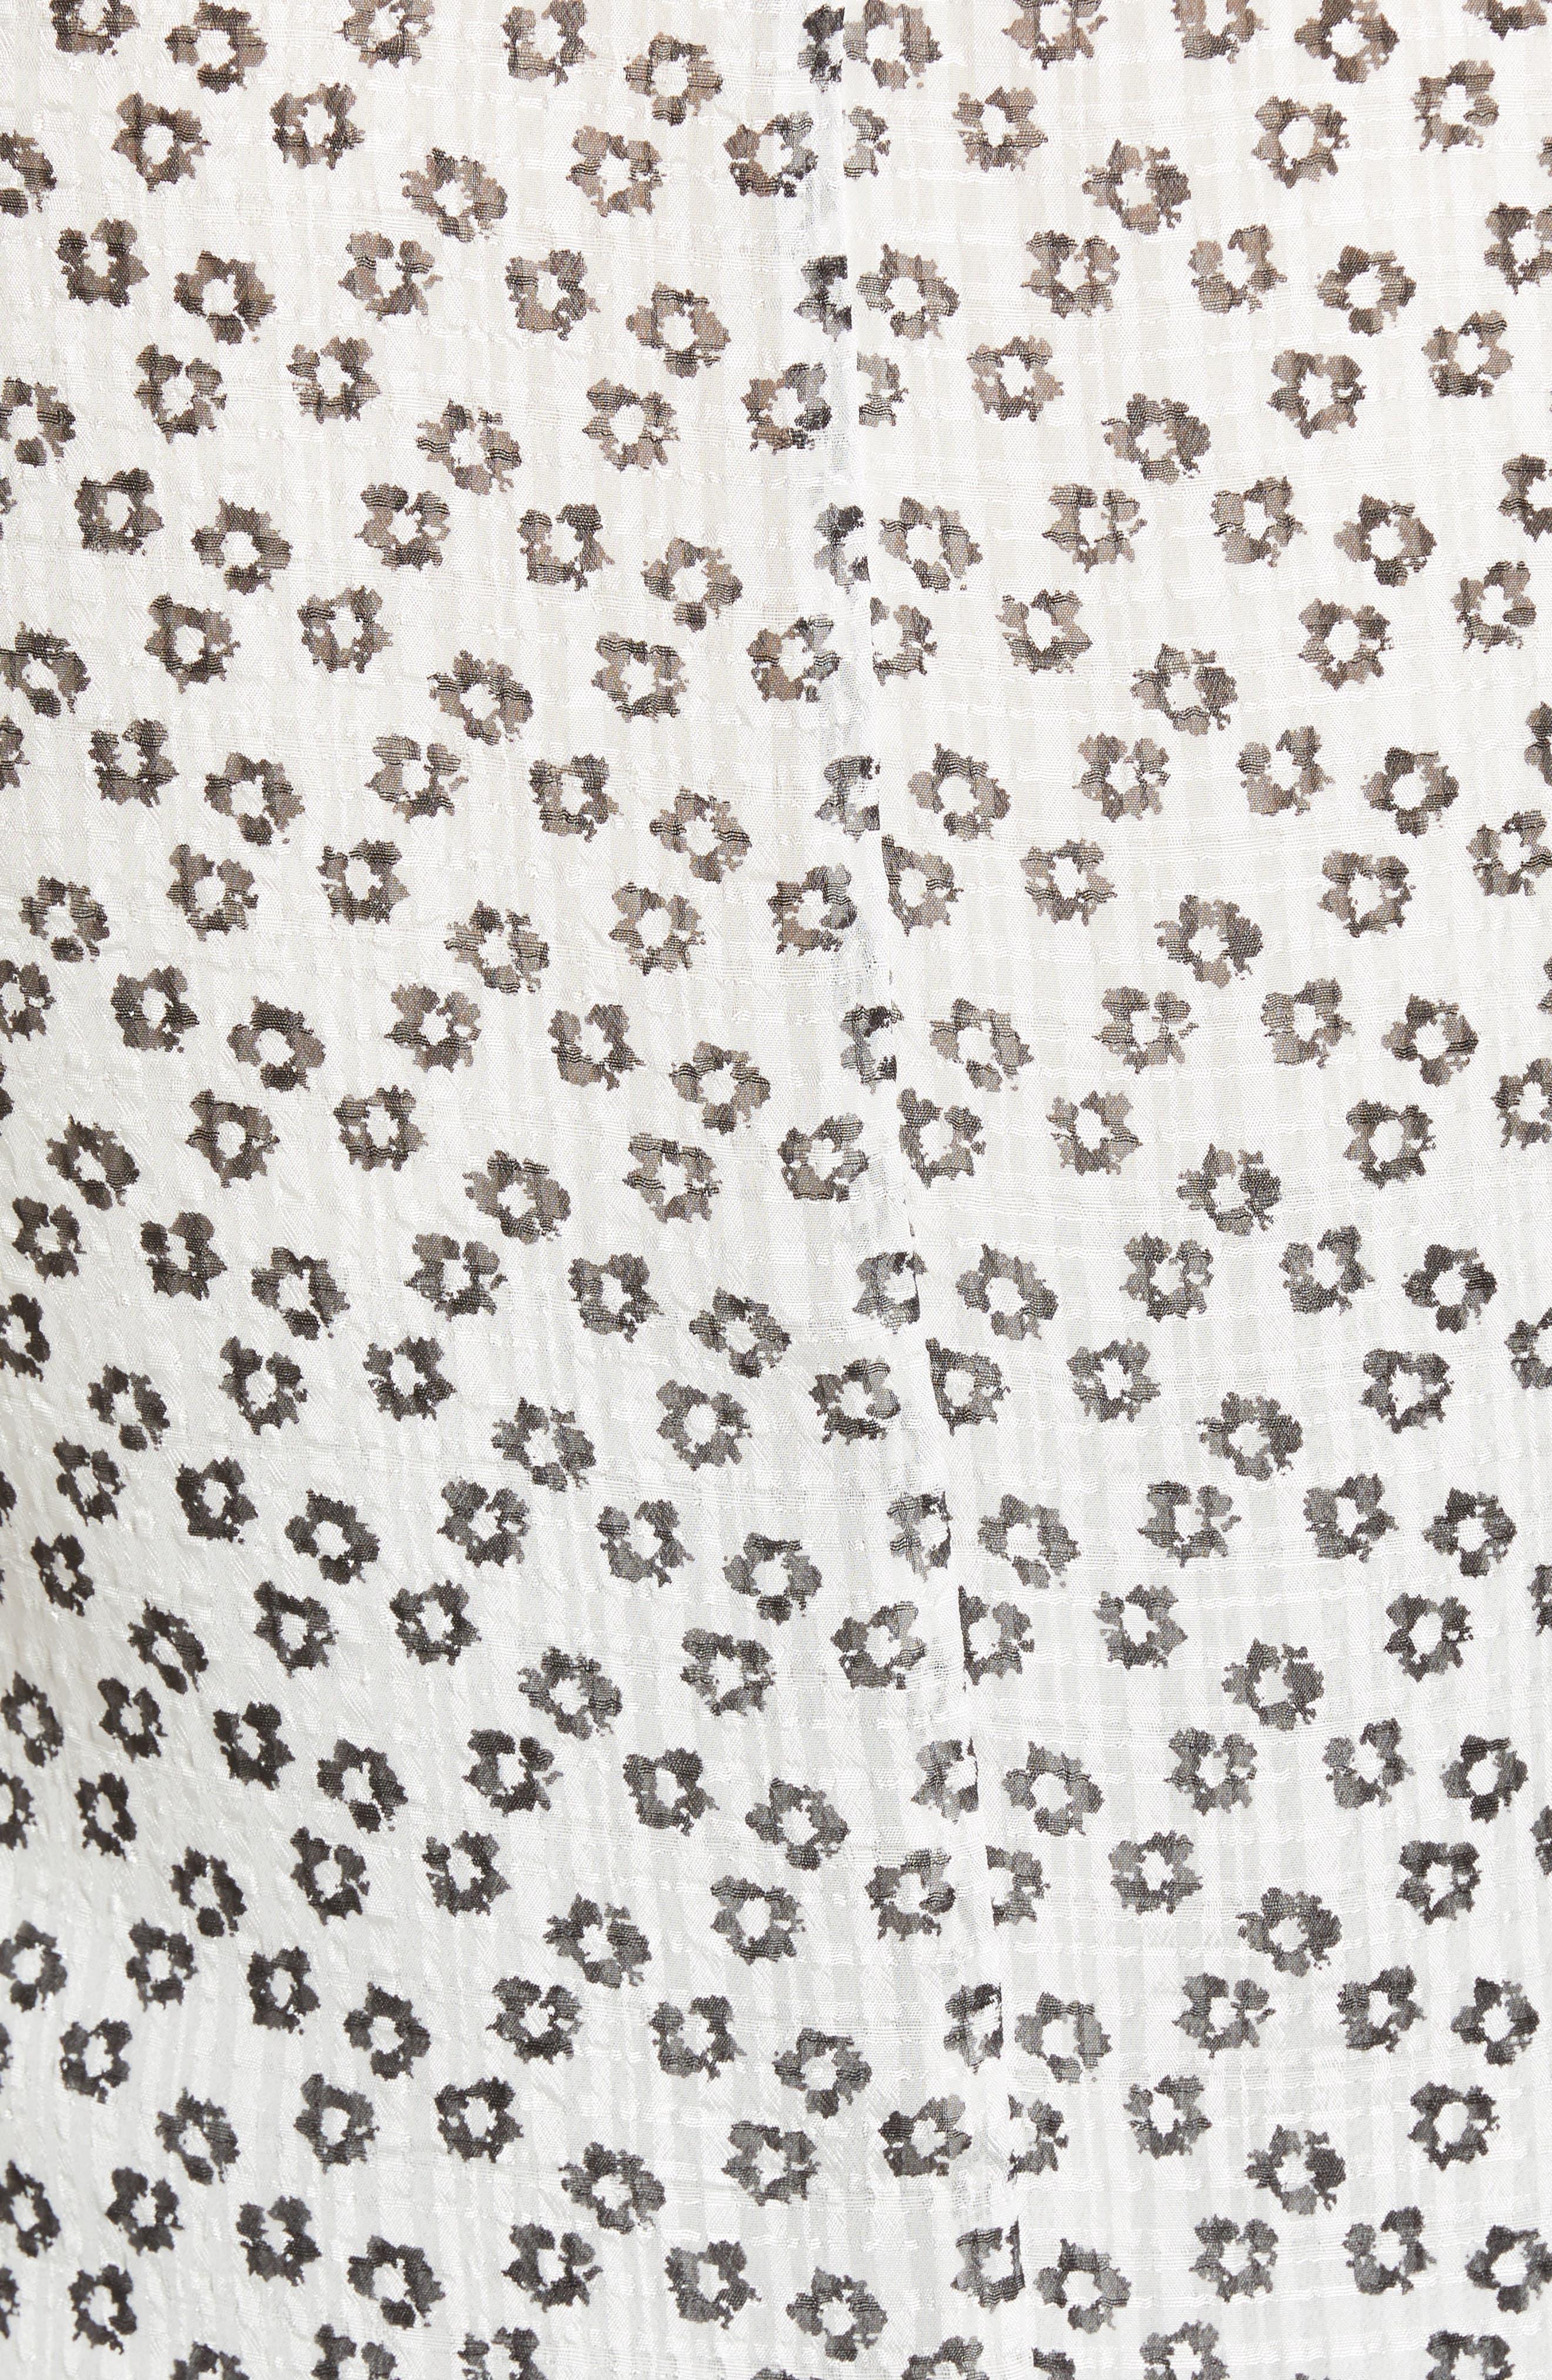 Flower Etching Ruffle Sleeve Top,                             Alternate thumbnail 5, color,                             SOFT ECRU